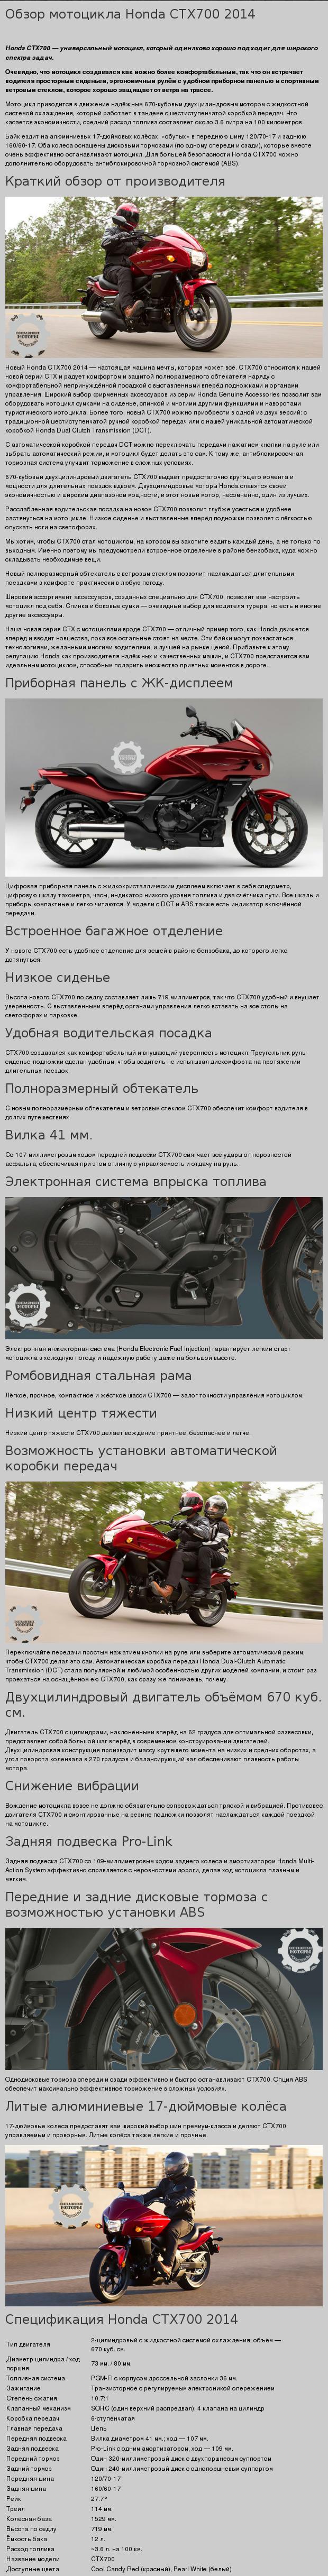 Обзор мотоцикла Honda CTX700 2014